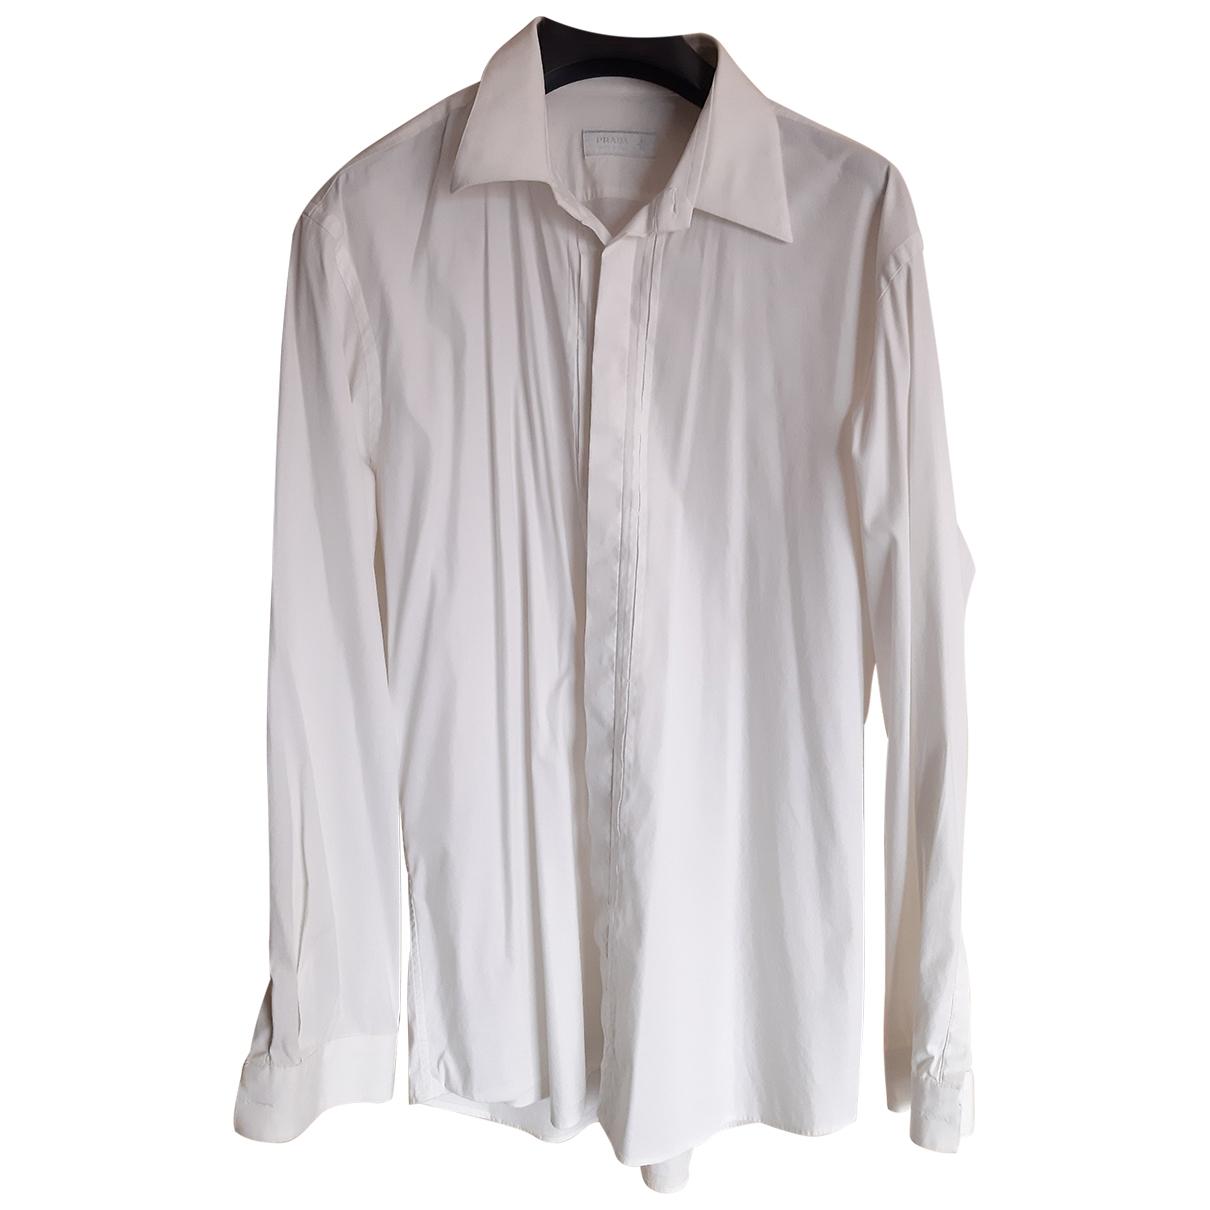 Prada \N White Cotton Shirts for Men M International